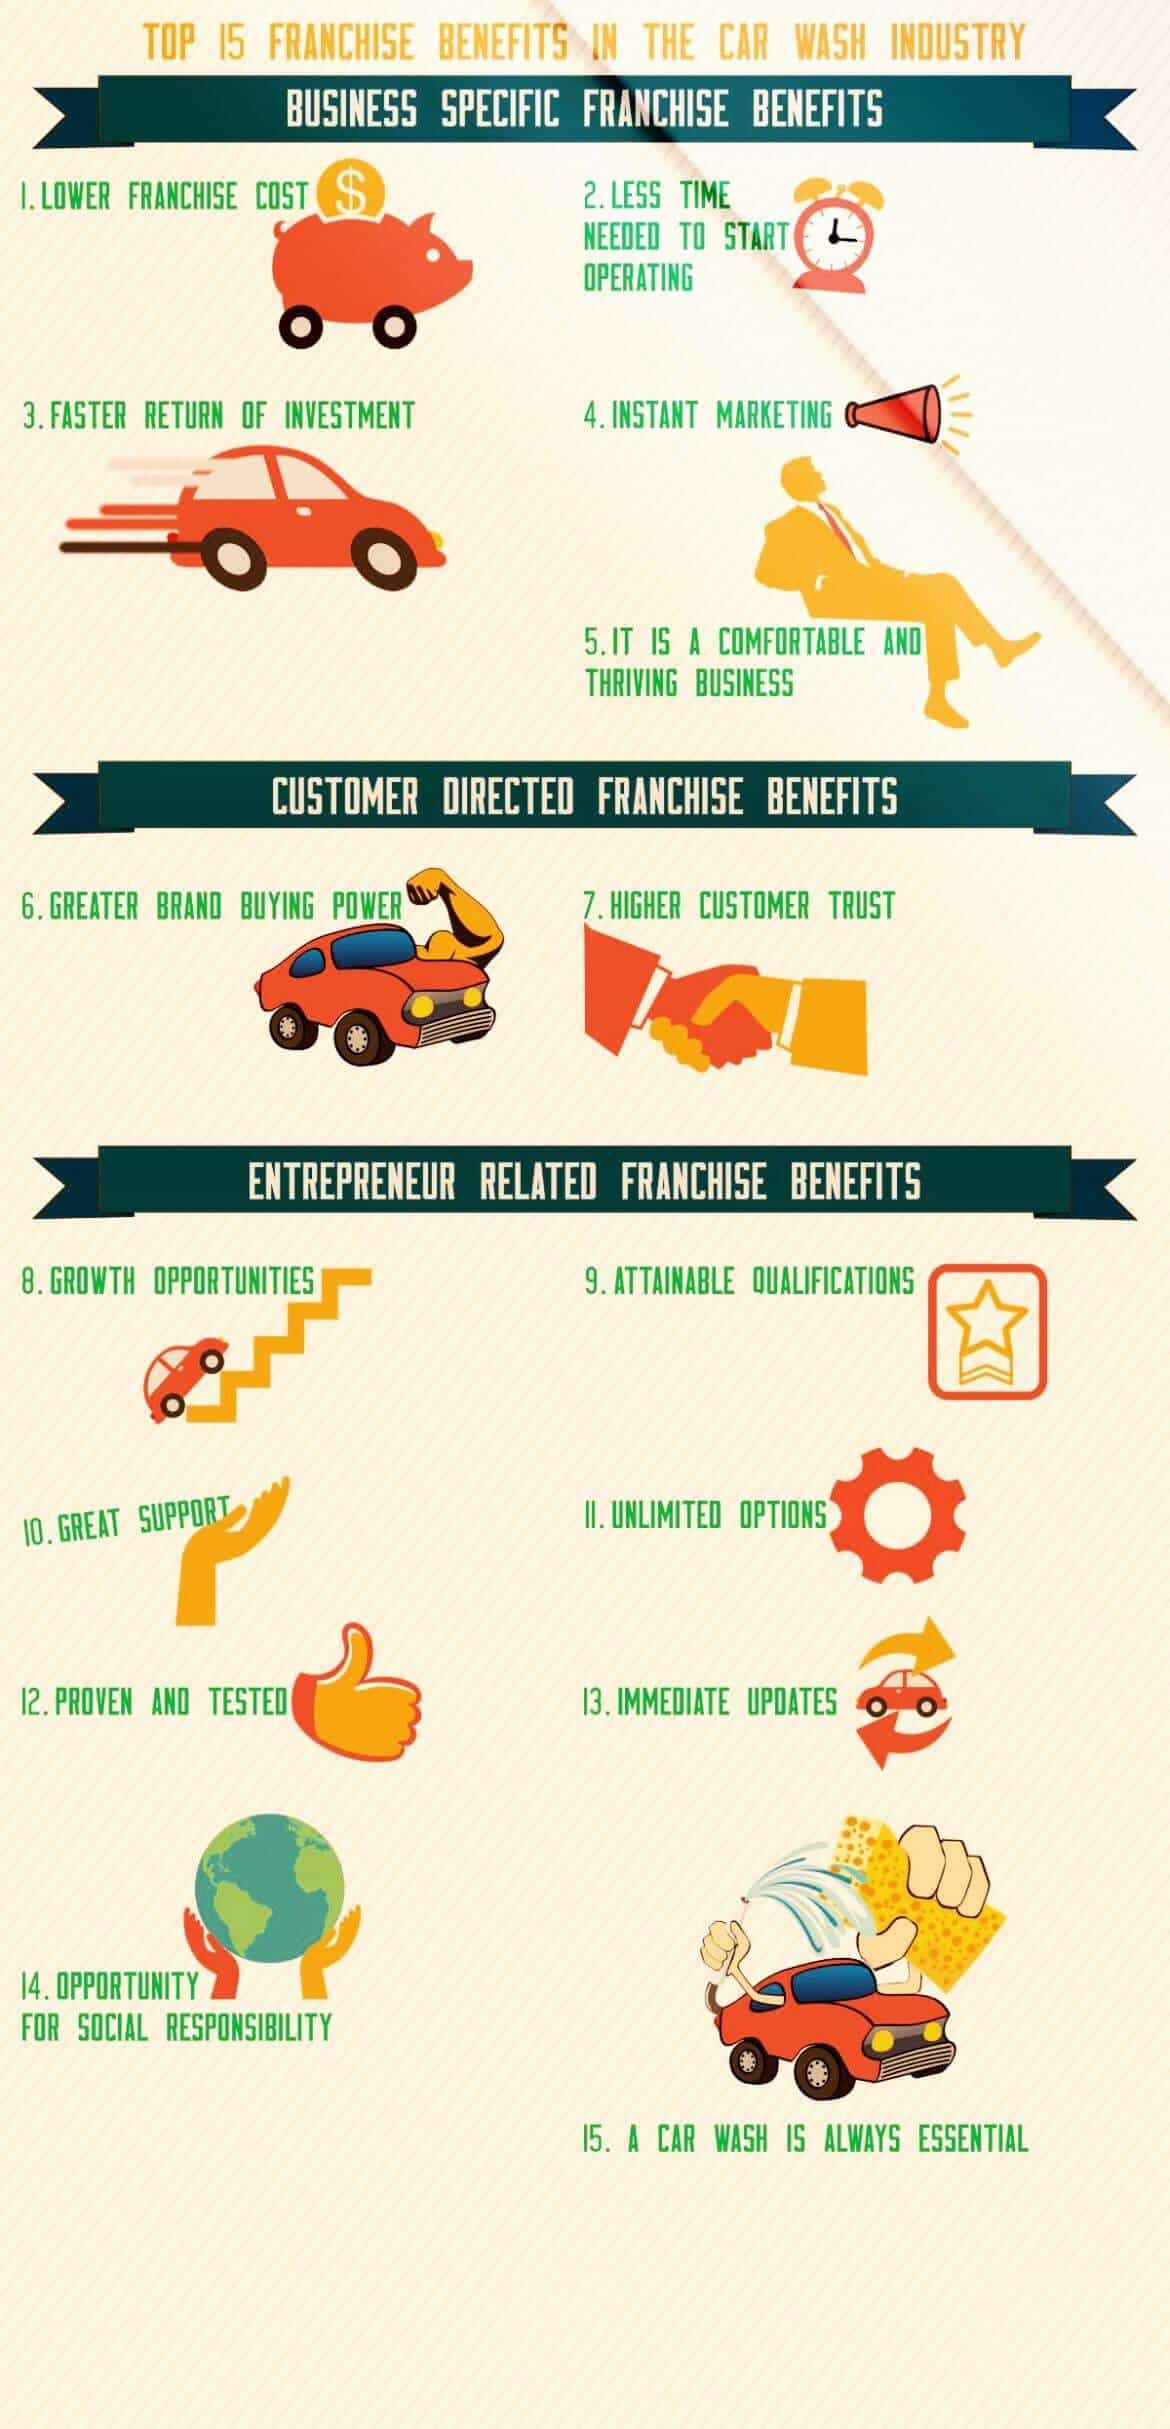 Car wash franchise benefits list